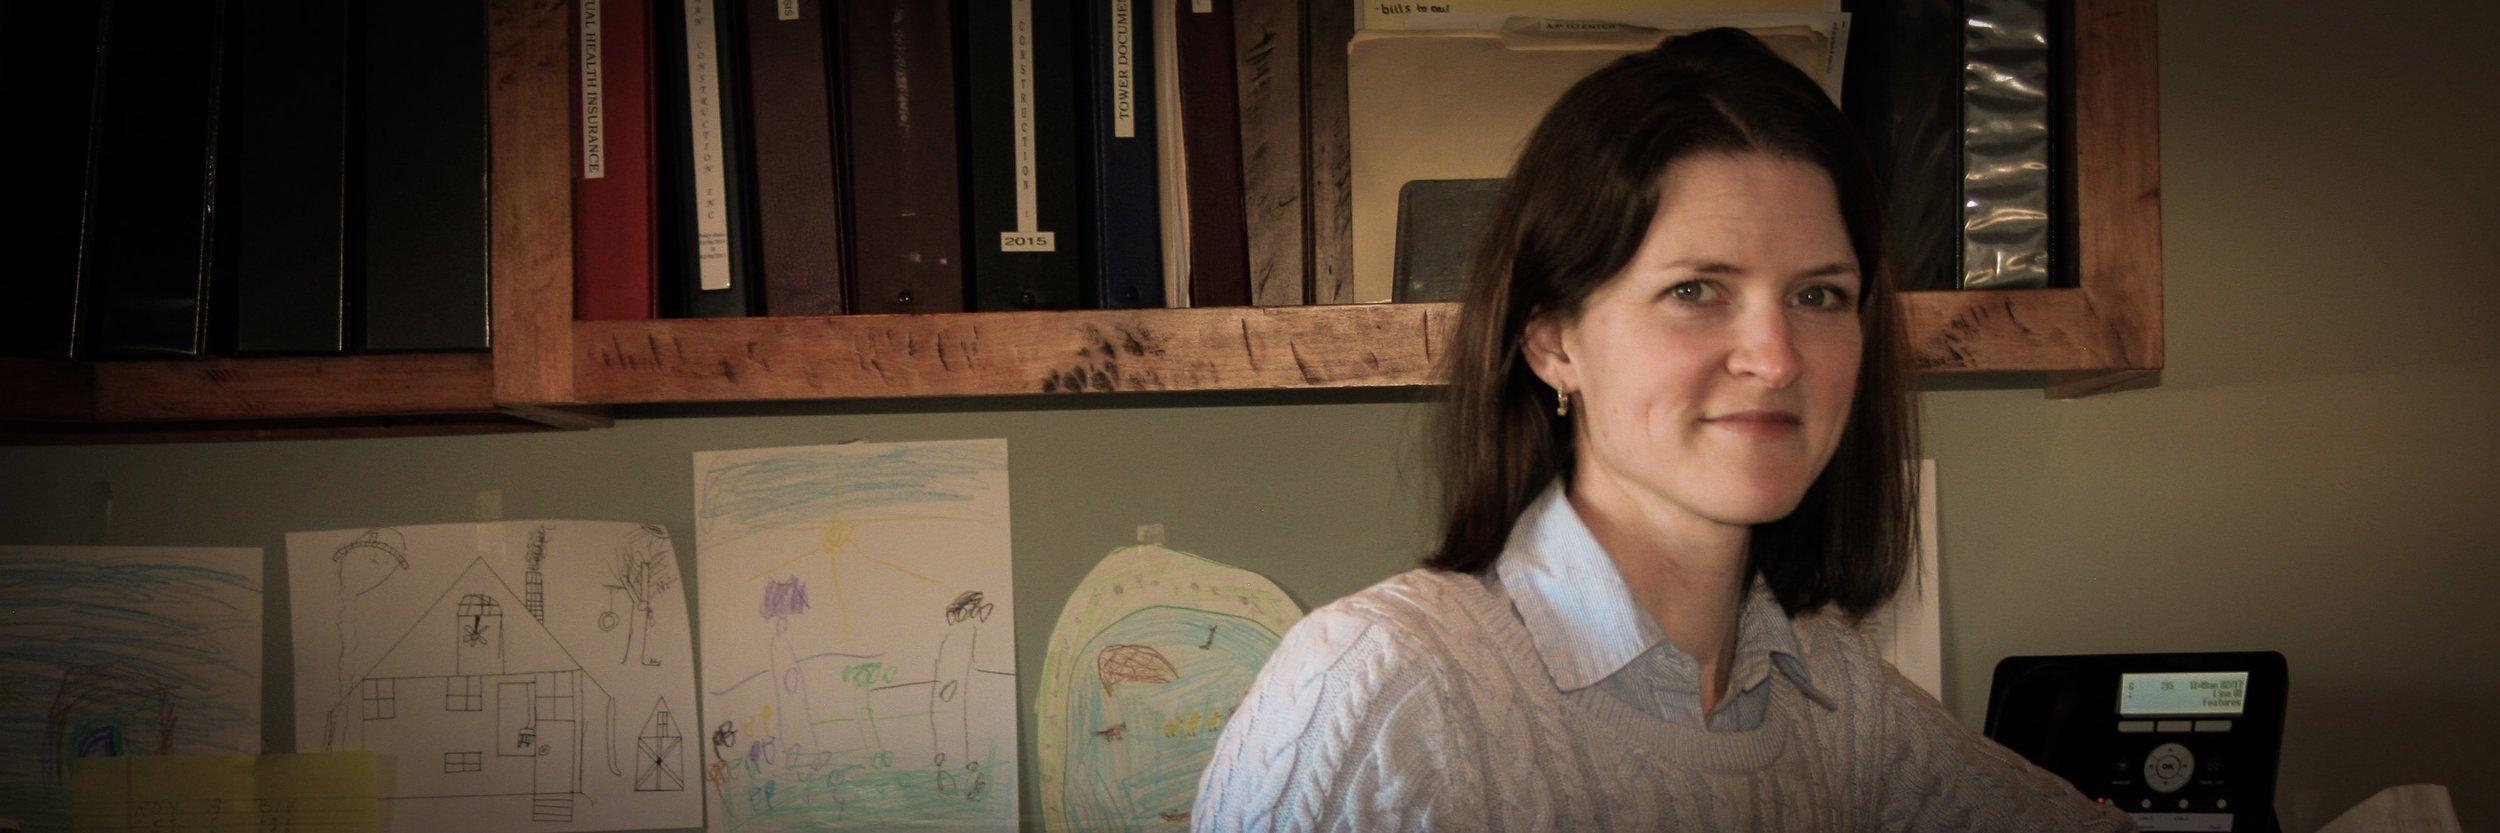 Jennifer Khoury - Vice President of Operations since 2001